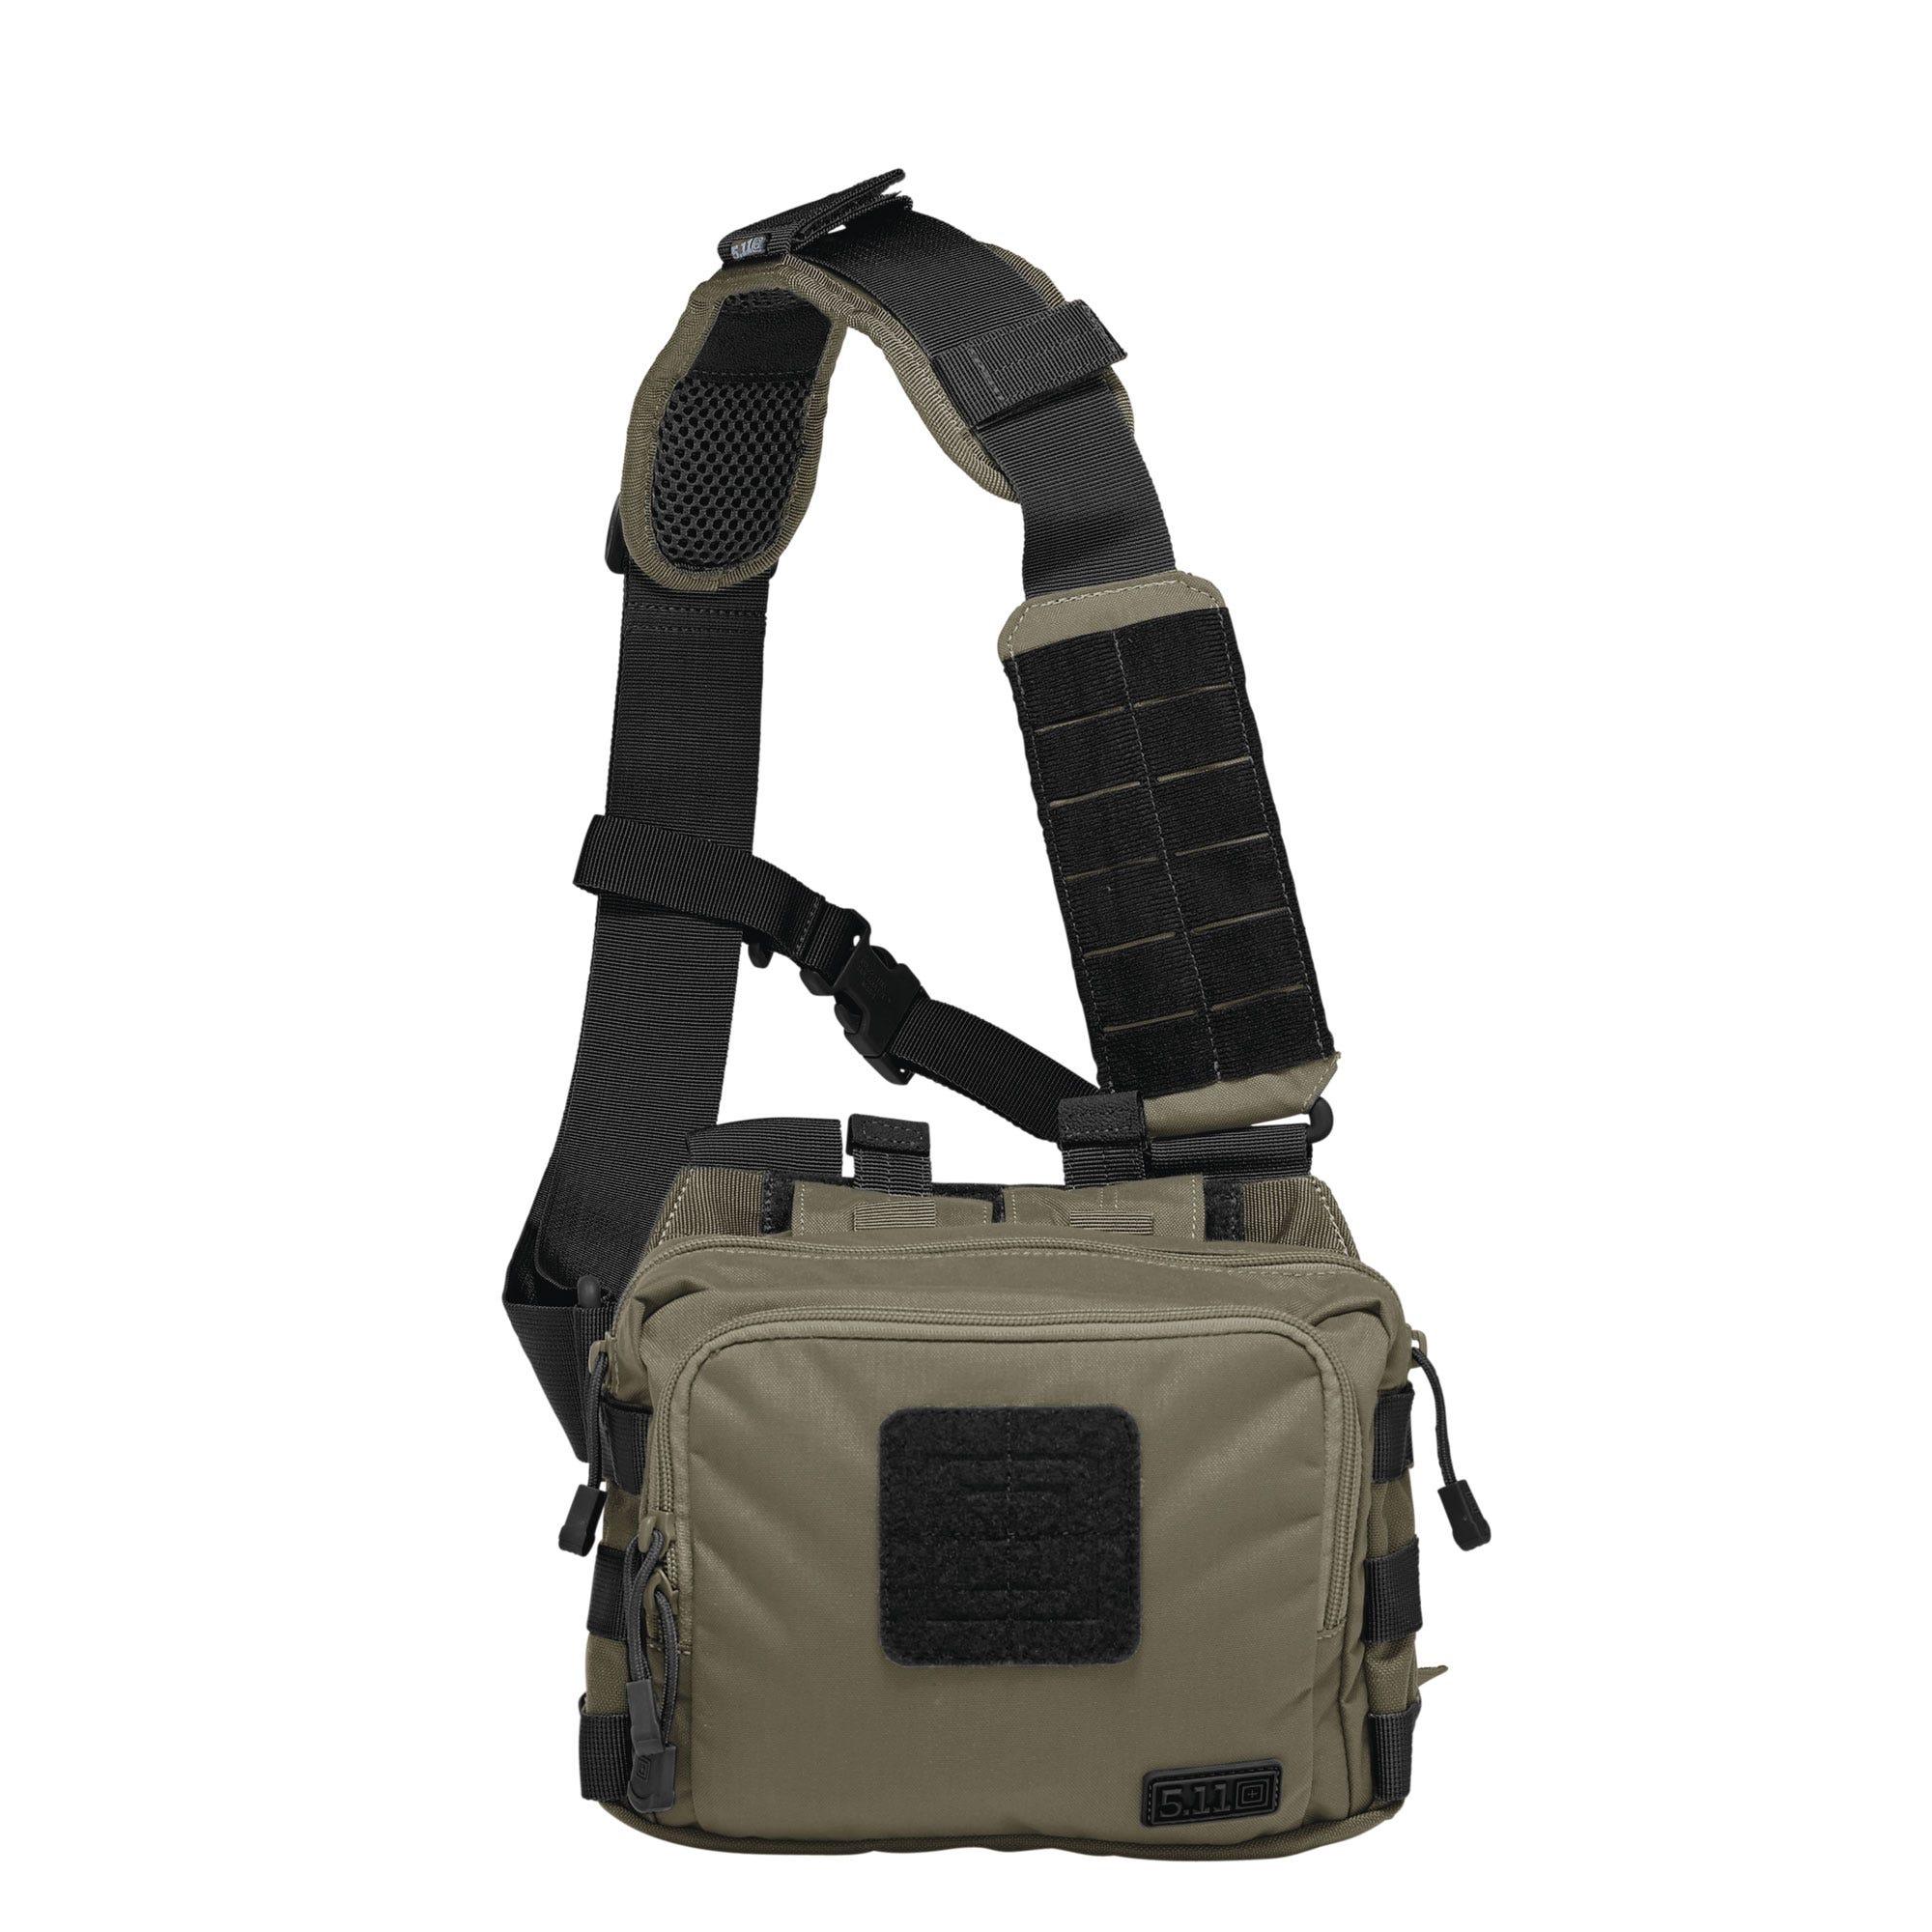 5.11 Tactical 2-Banger Bag (Khaki/Tan;Black;Green;Multi), (CCW Concealed Carry) thumbnail